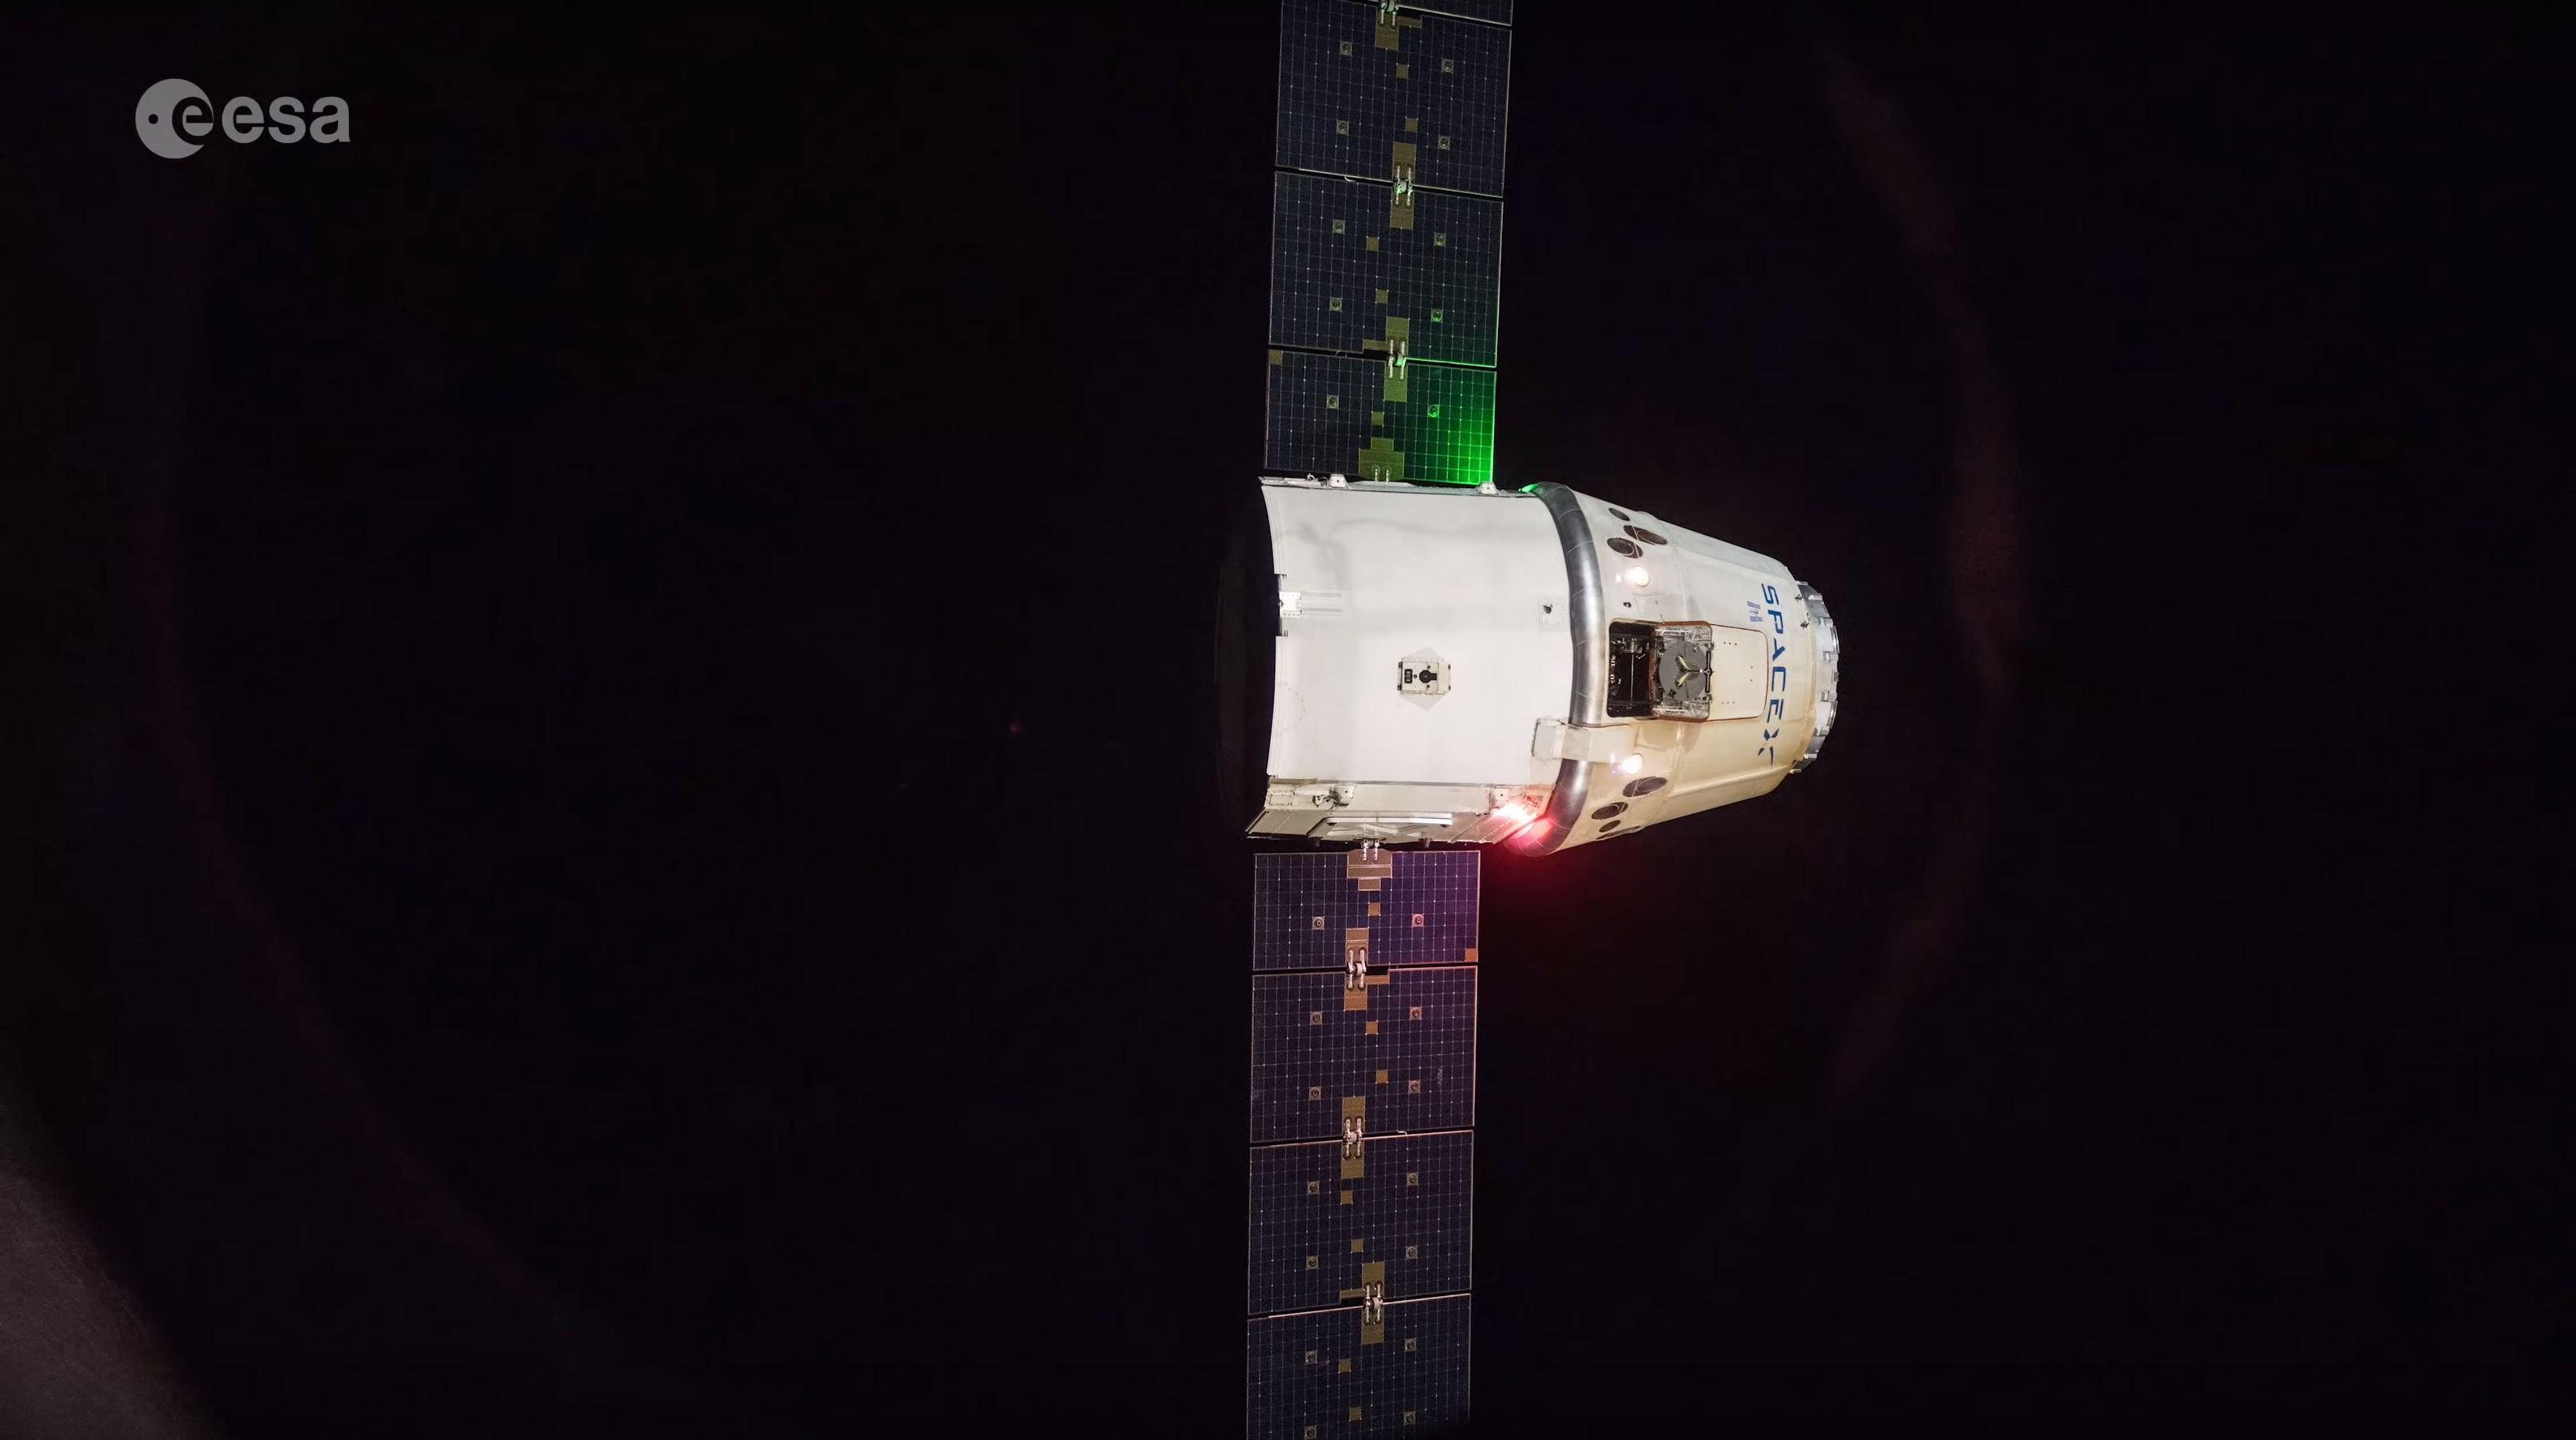 CRS-15 Cargo Dragon Draco burns (ESA) 2